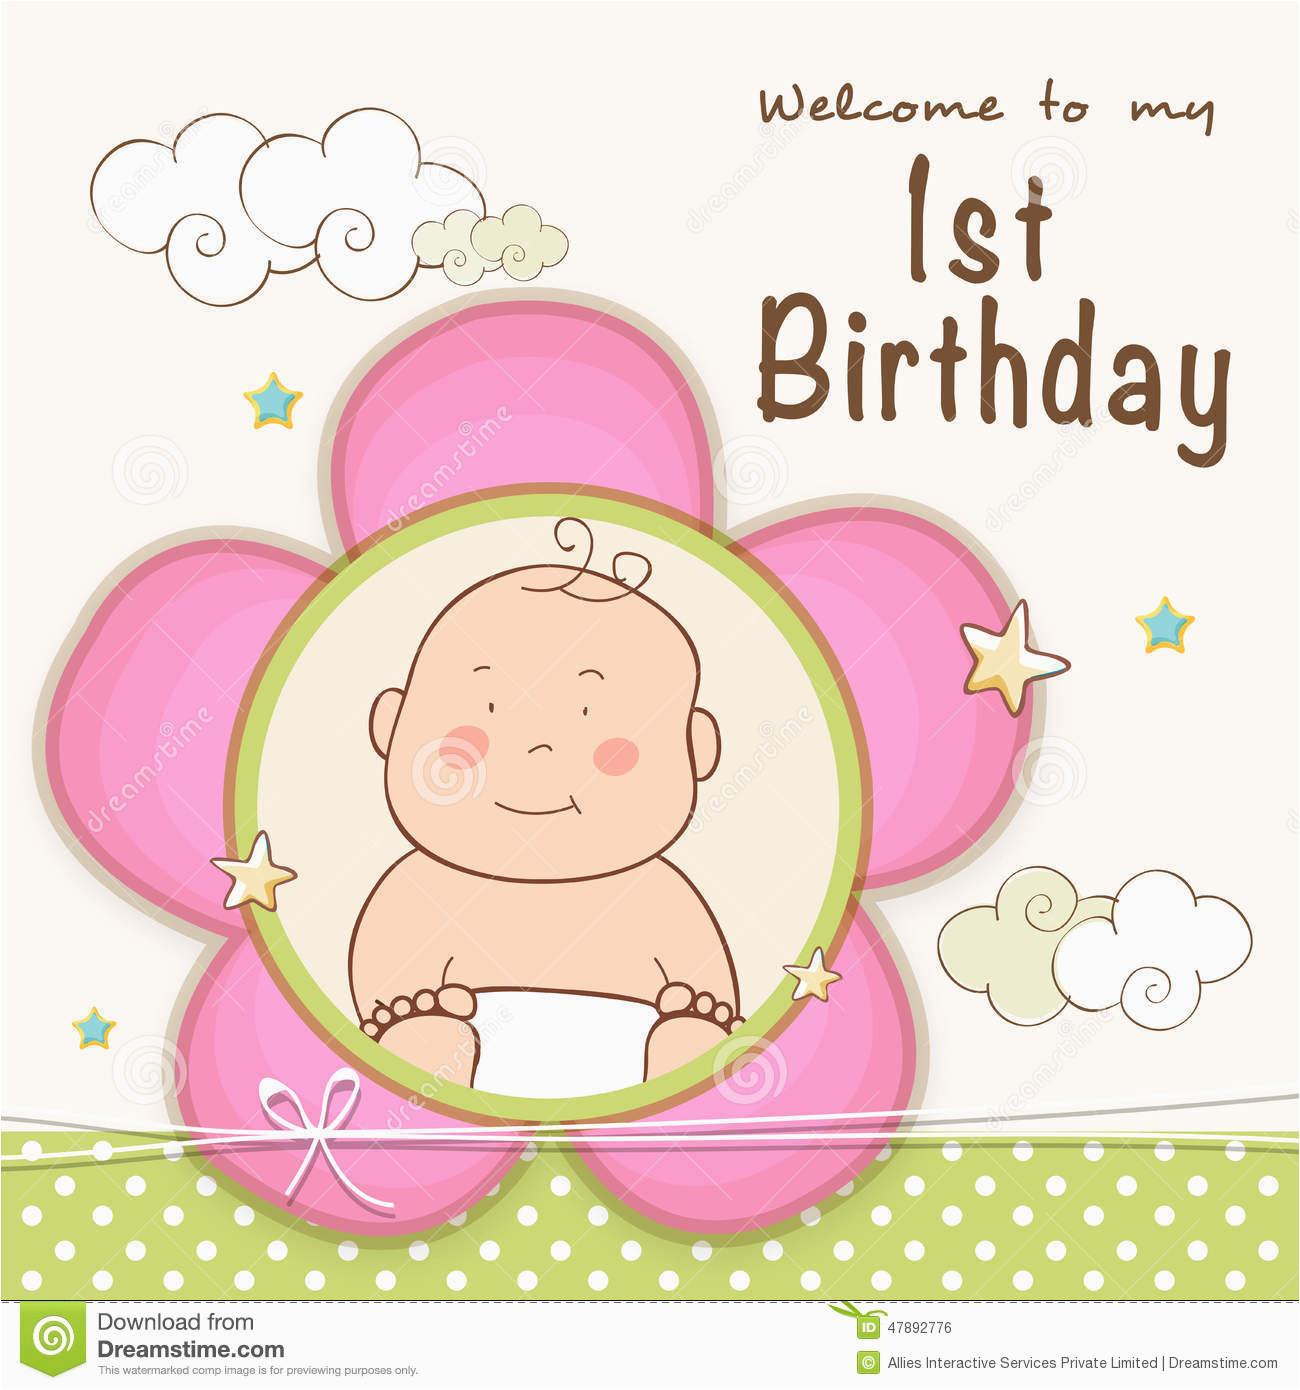 Child Birthday Cards Designs 1st Birthday Invitation Card Design Stock Illustration